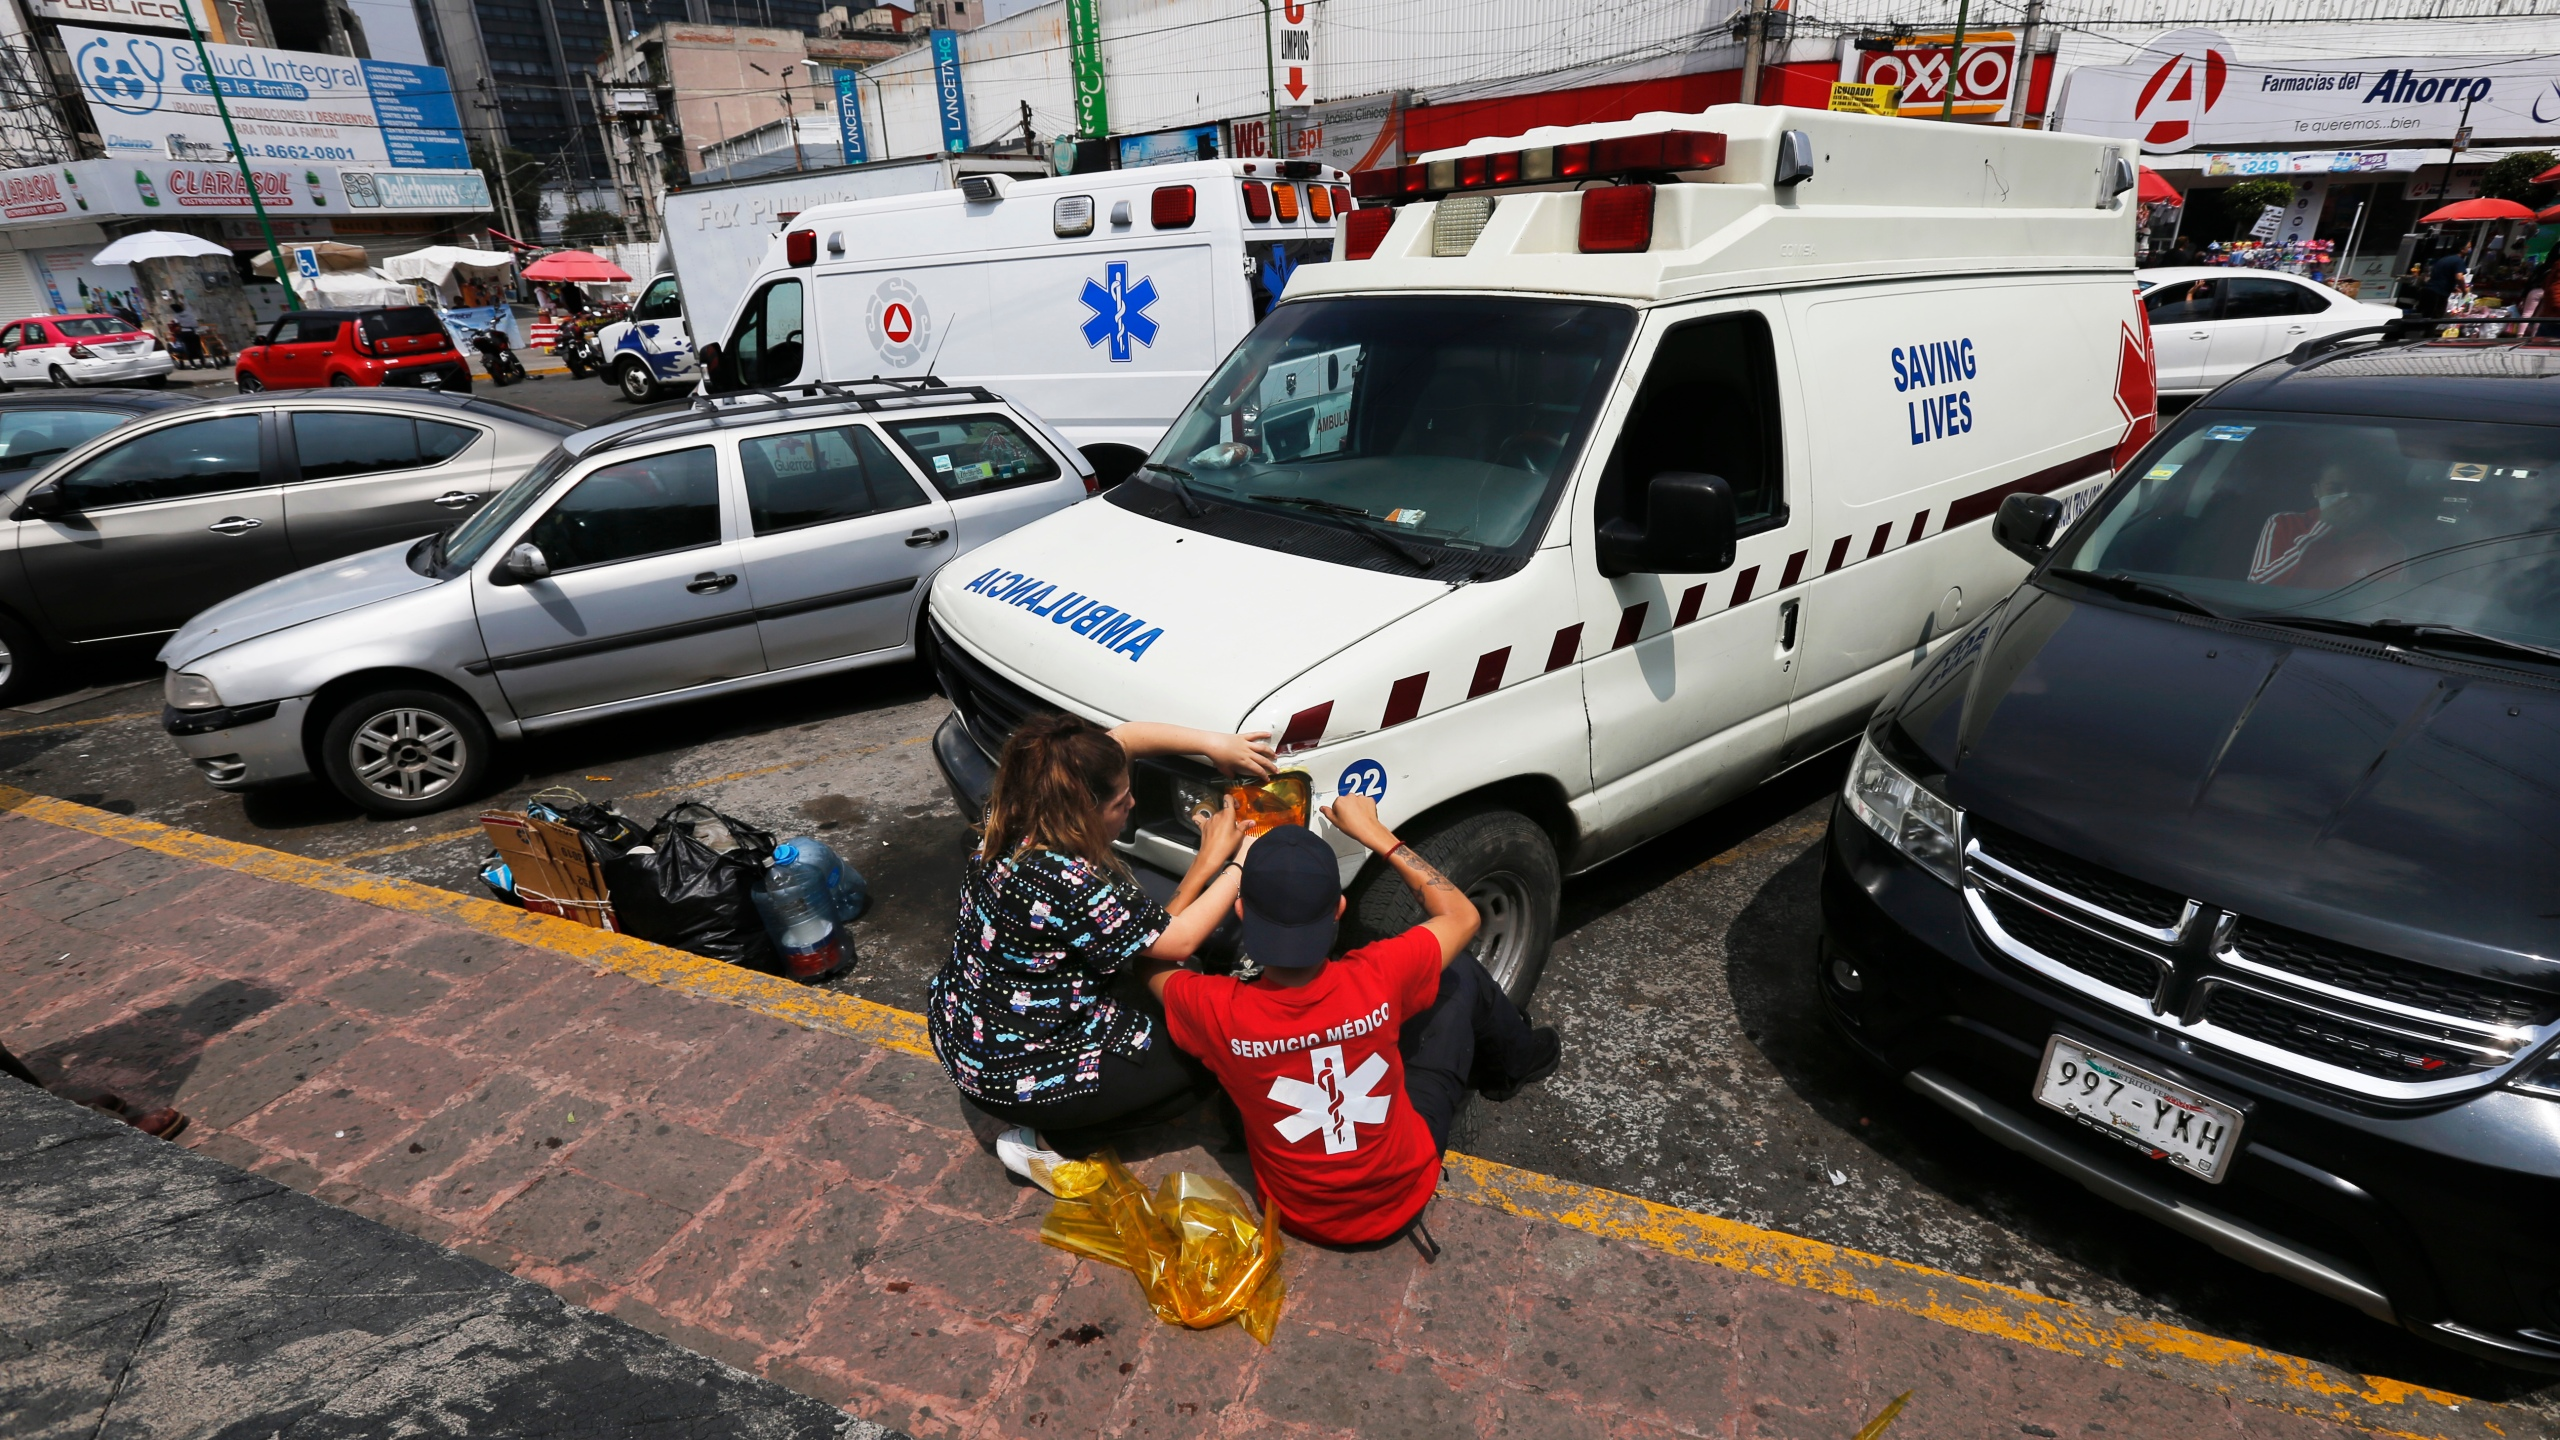 Mchd Ambulance Christmas Parade 2020 Mexico's pirate ambulances profiteering in the pandemic – WKRG News 5